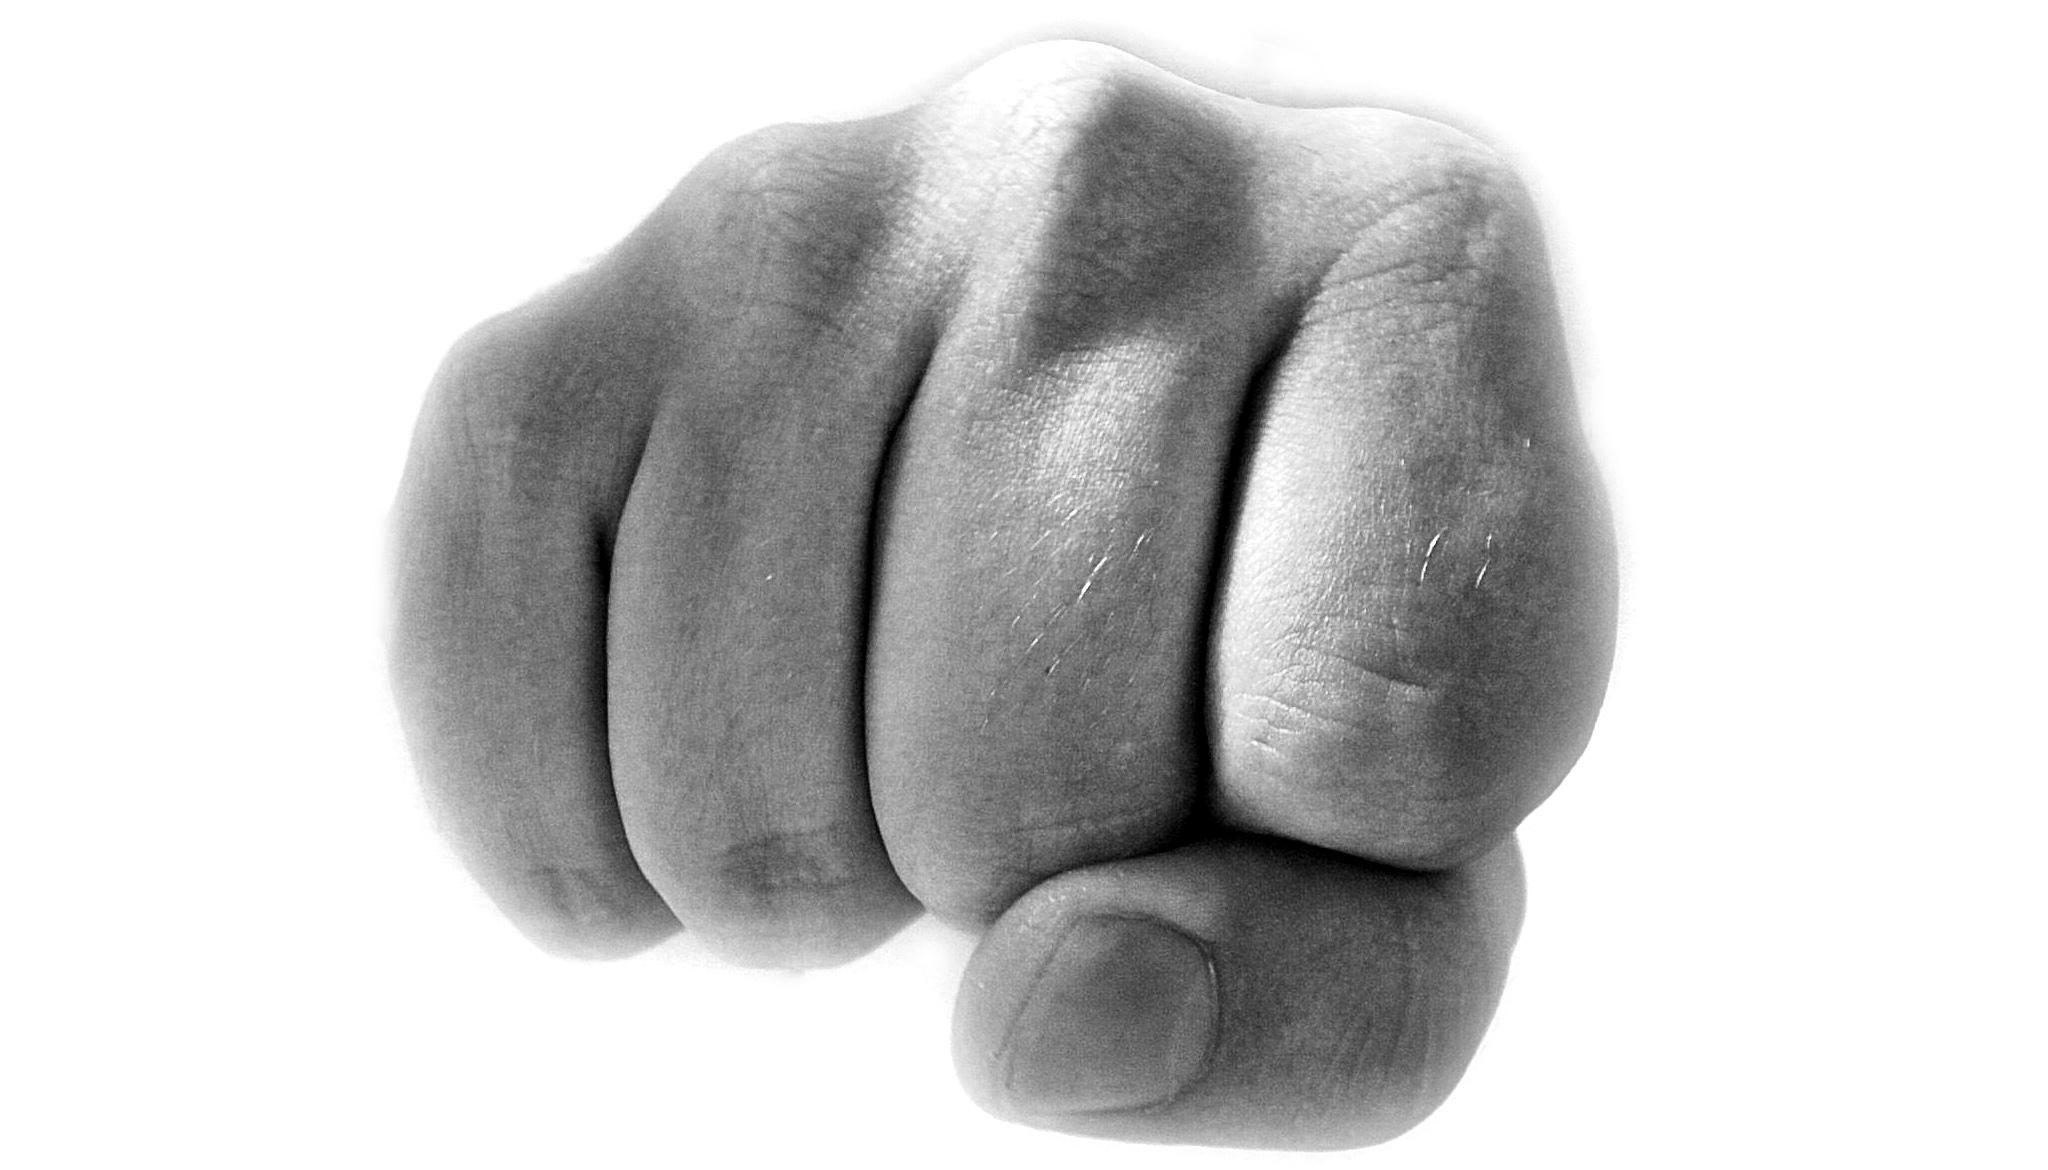 Фото русский кулак 1 фотография